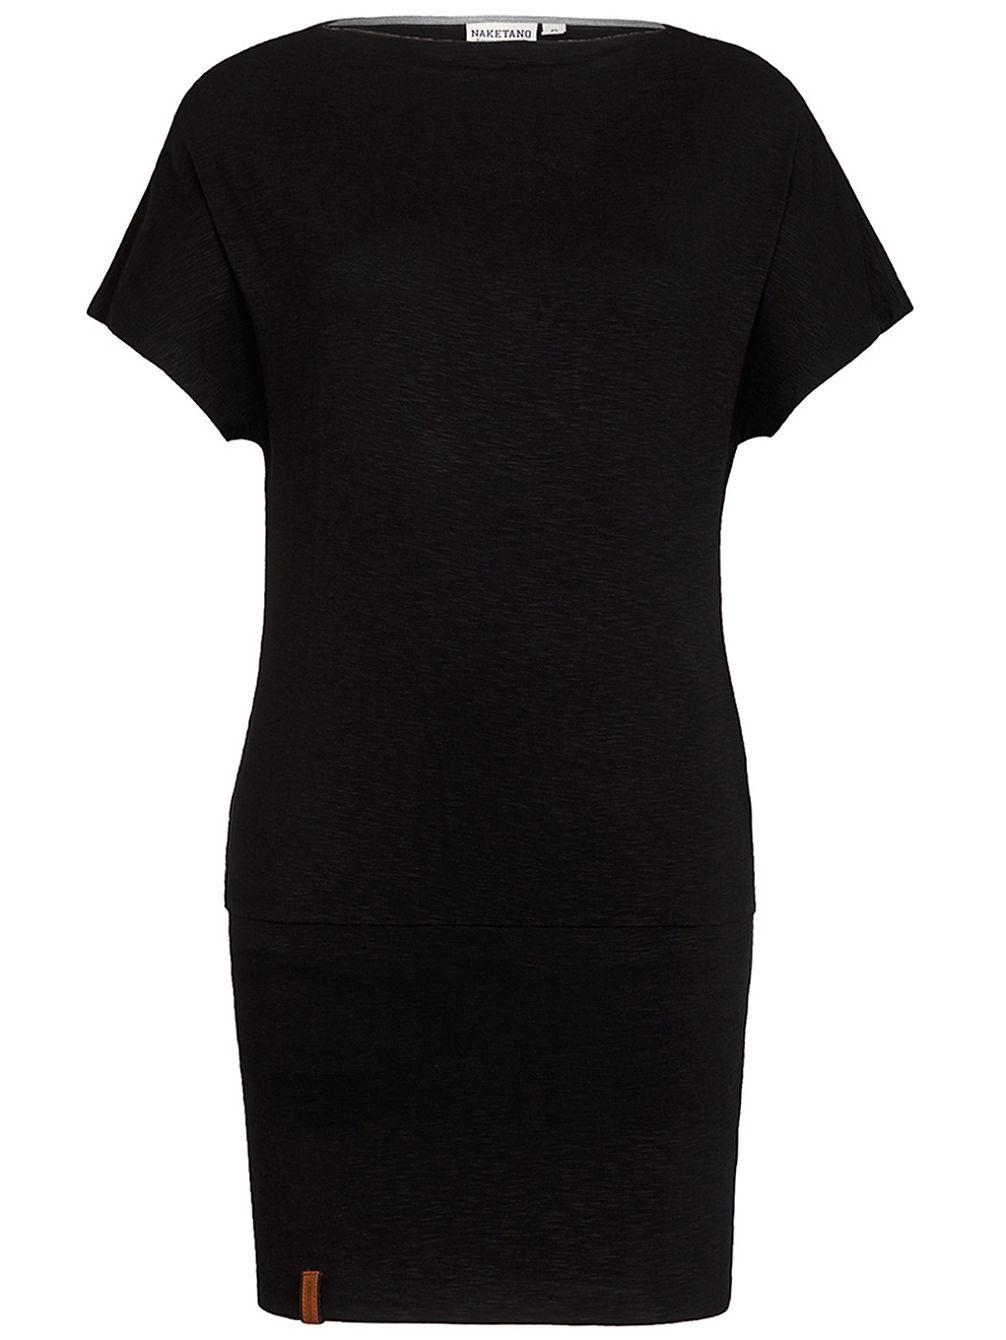 naketano-linda-viii-t-shirt